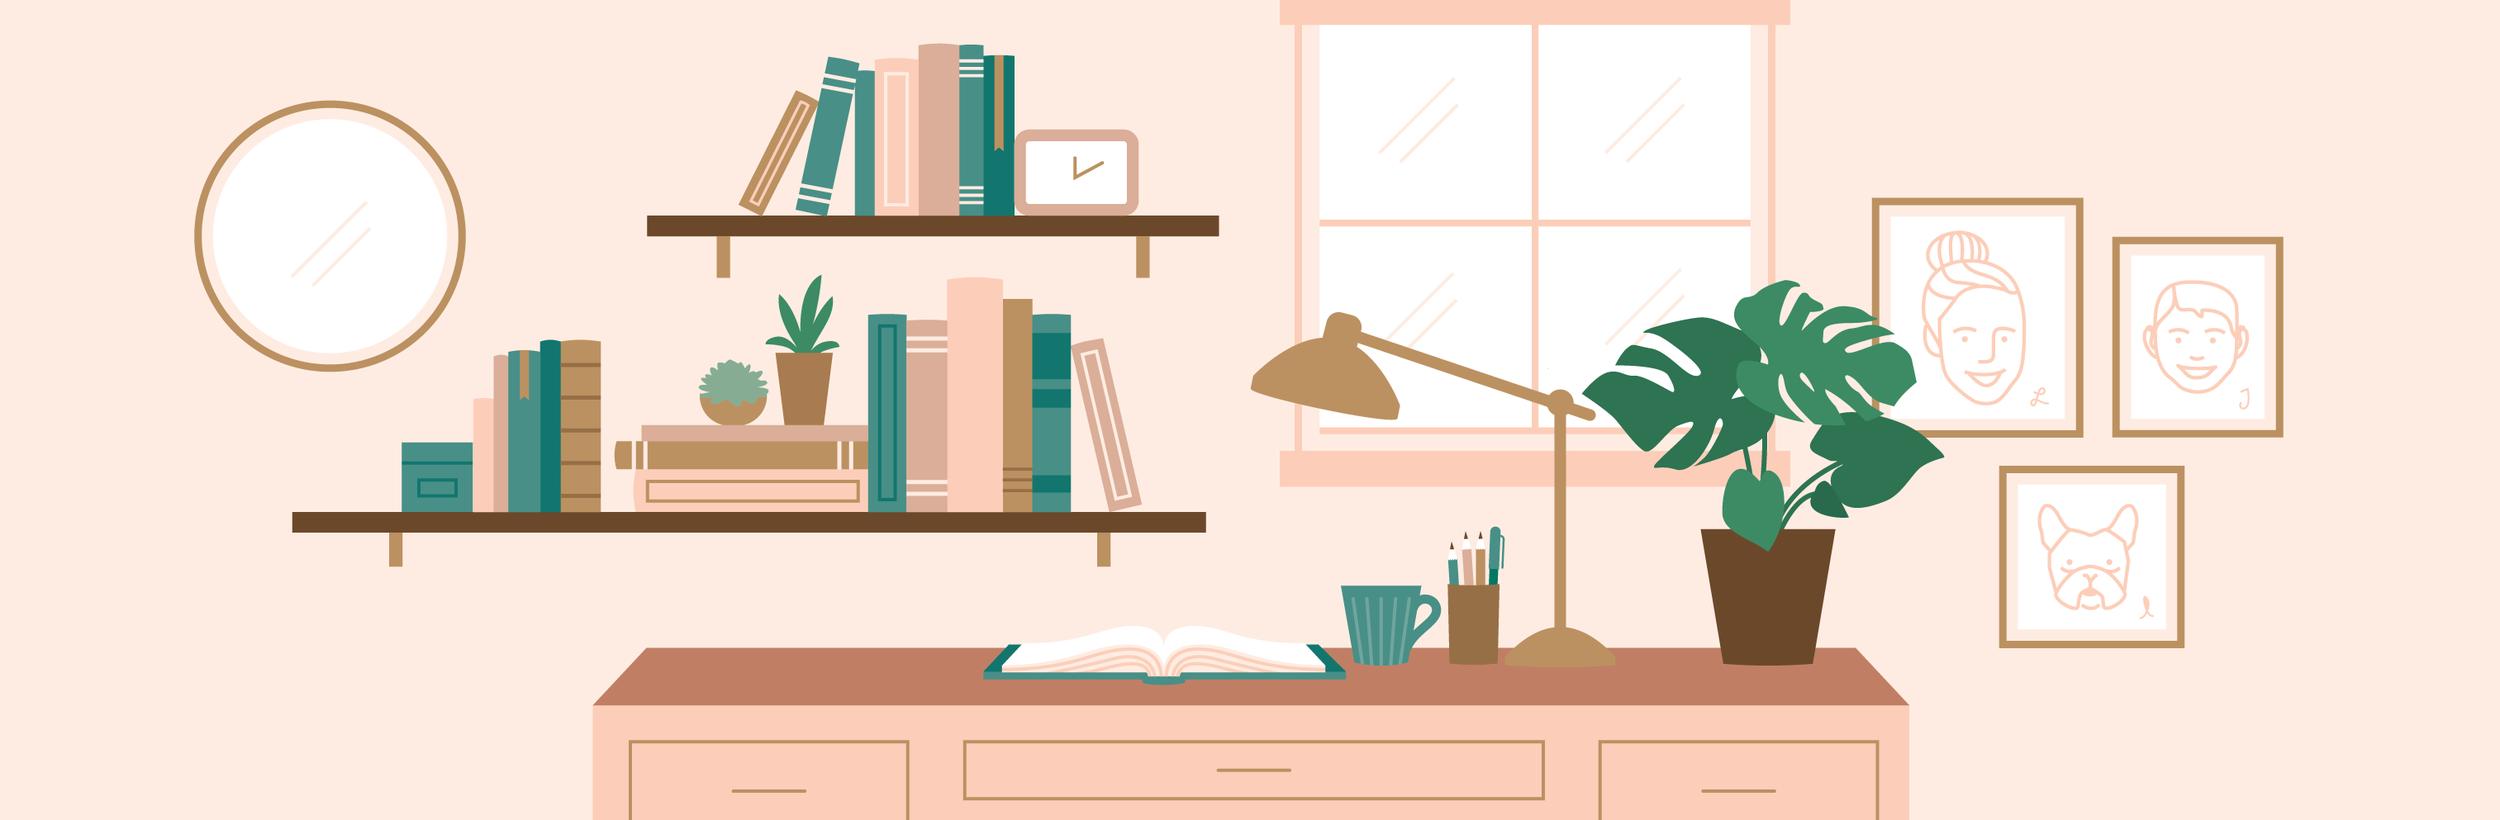 TinyTriumphCo_Web_Header_Illustration_112218.png